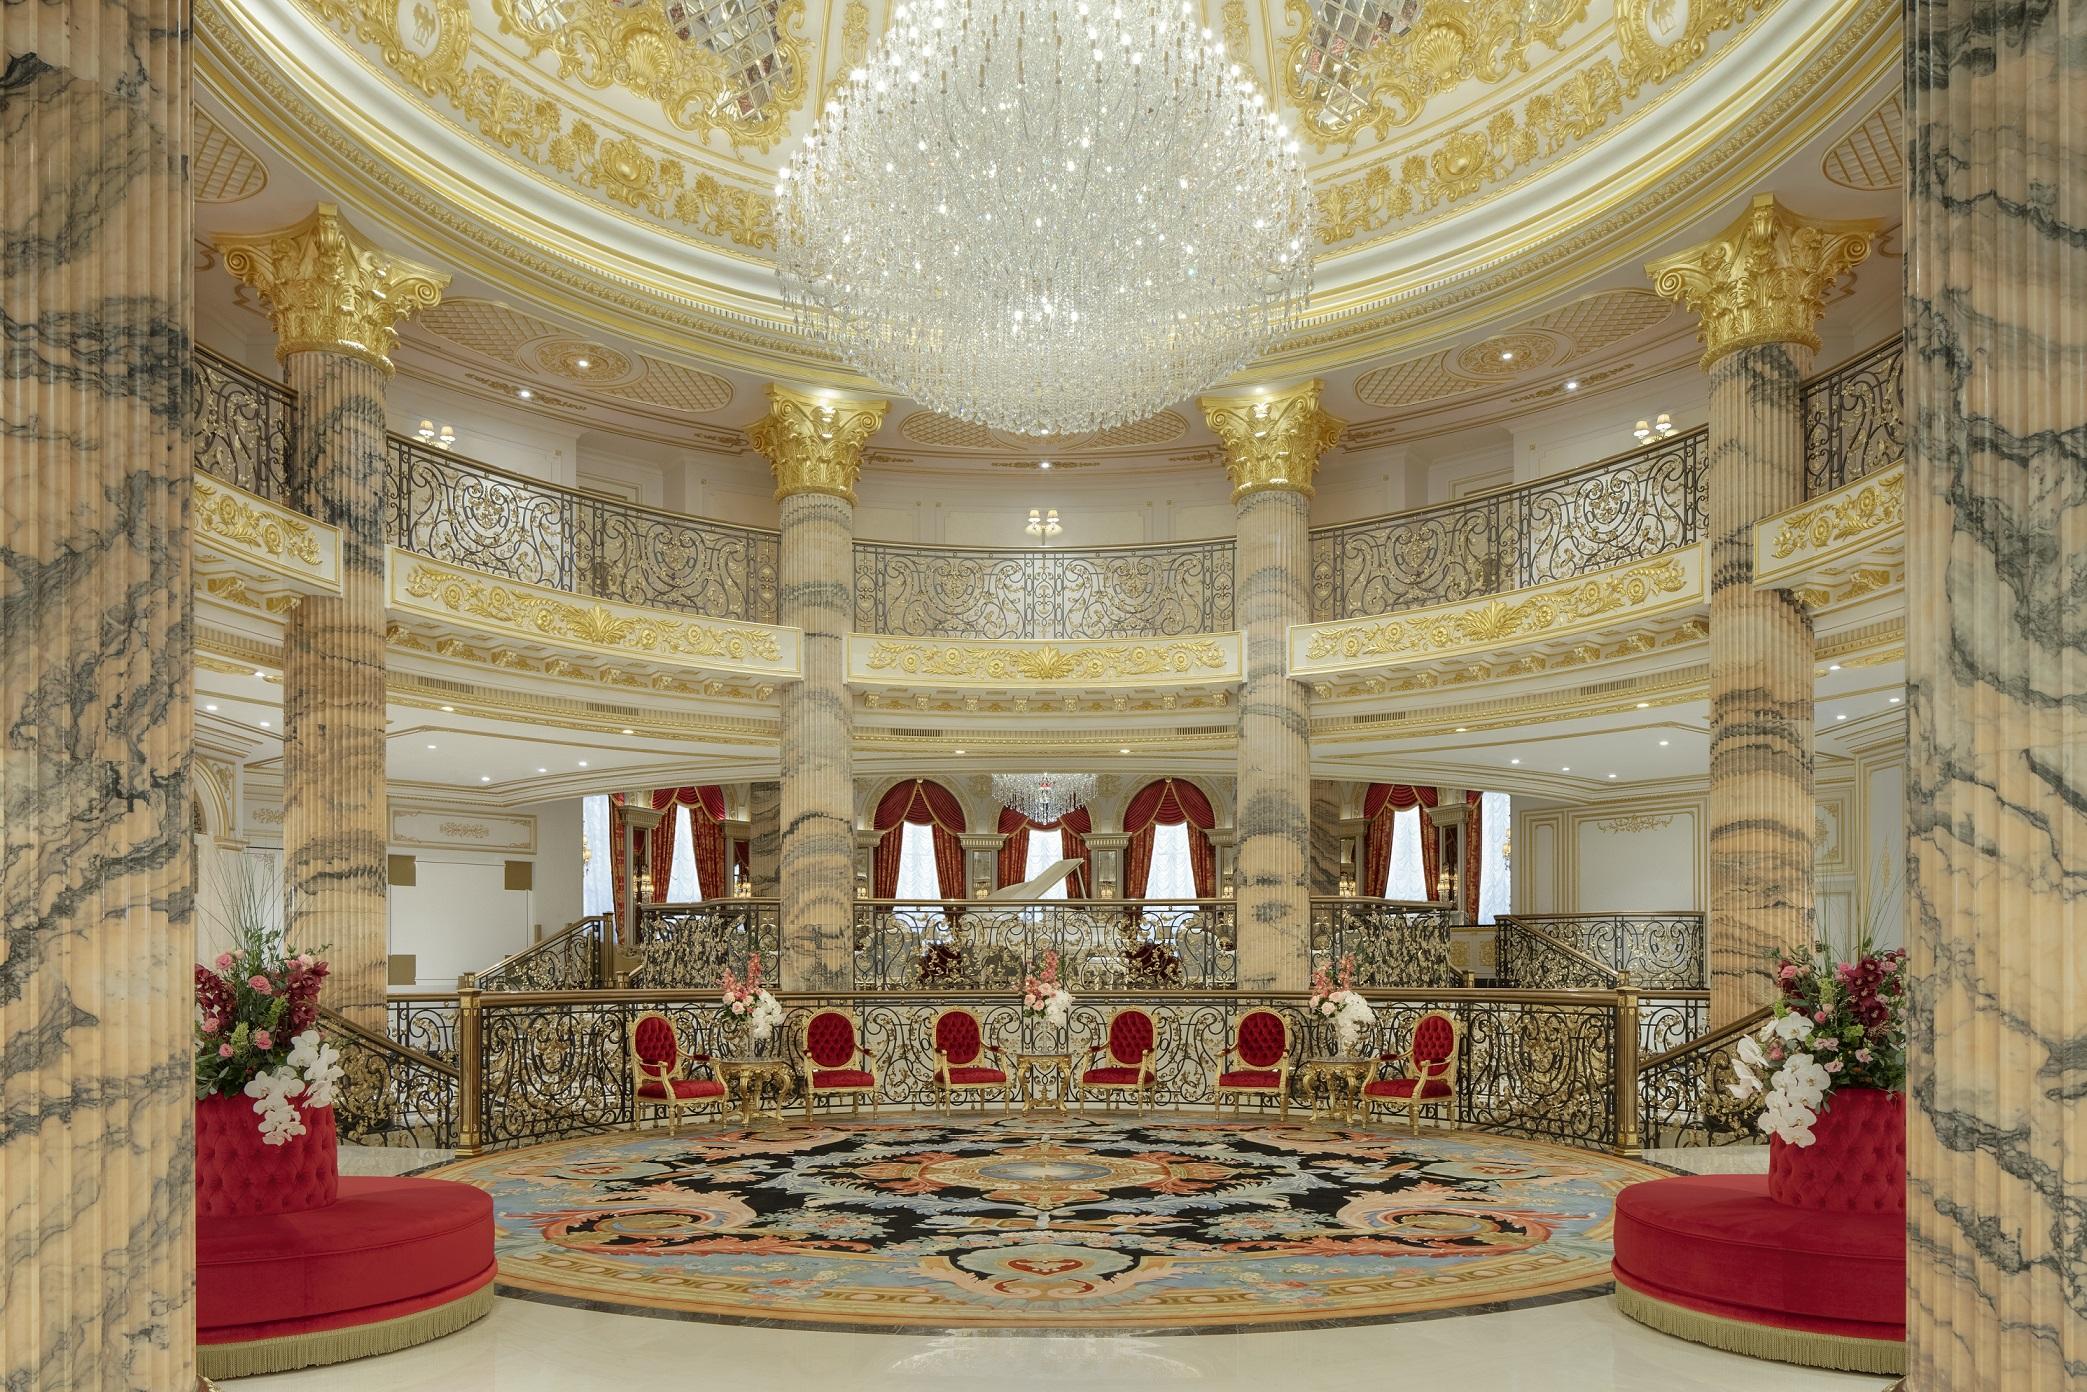 Raffles The Palm Dubai - Grand Foyer